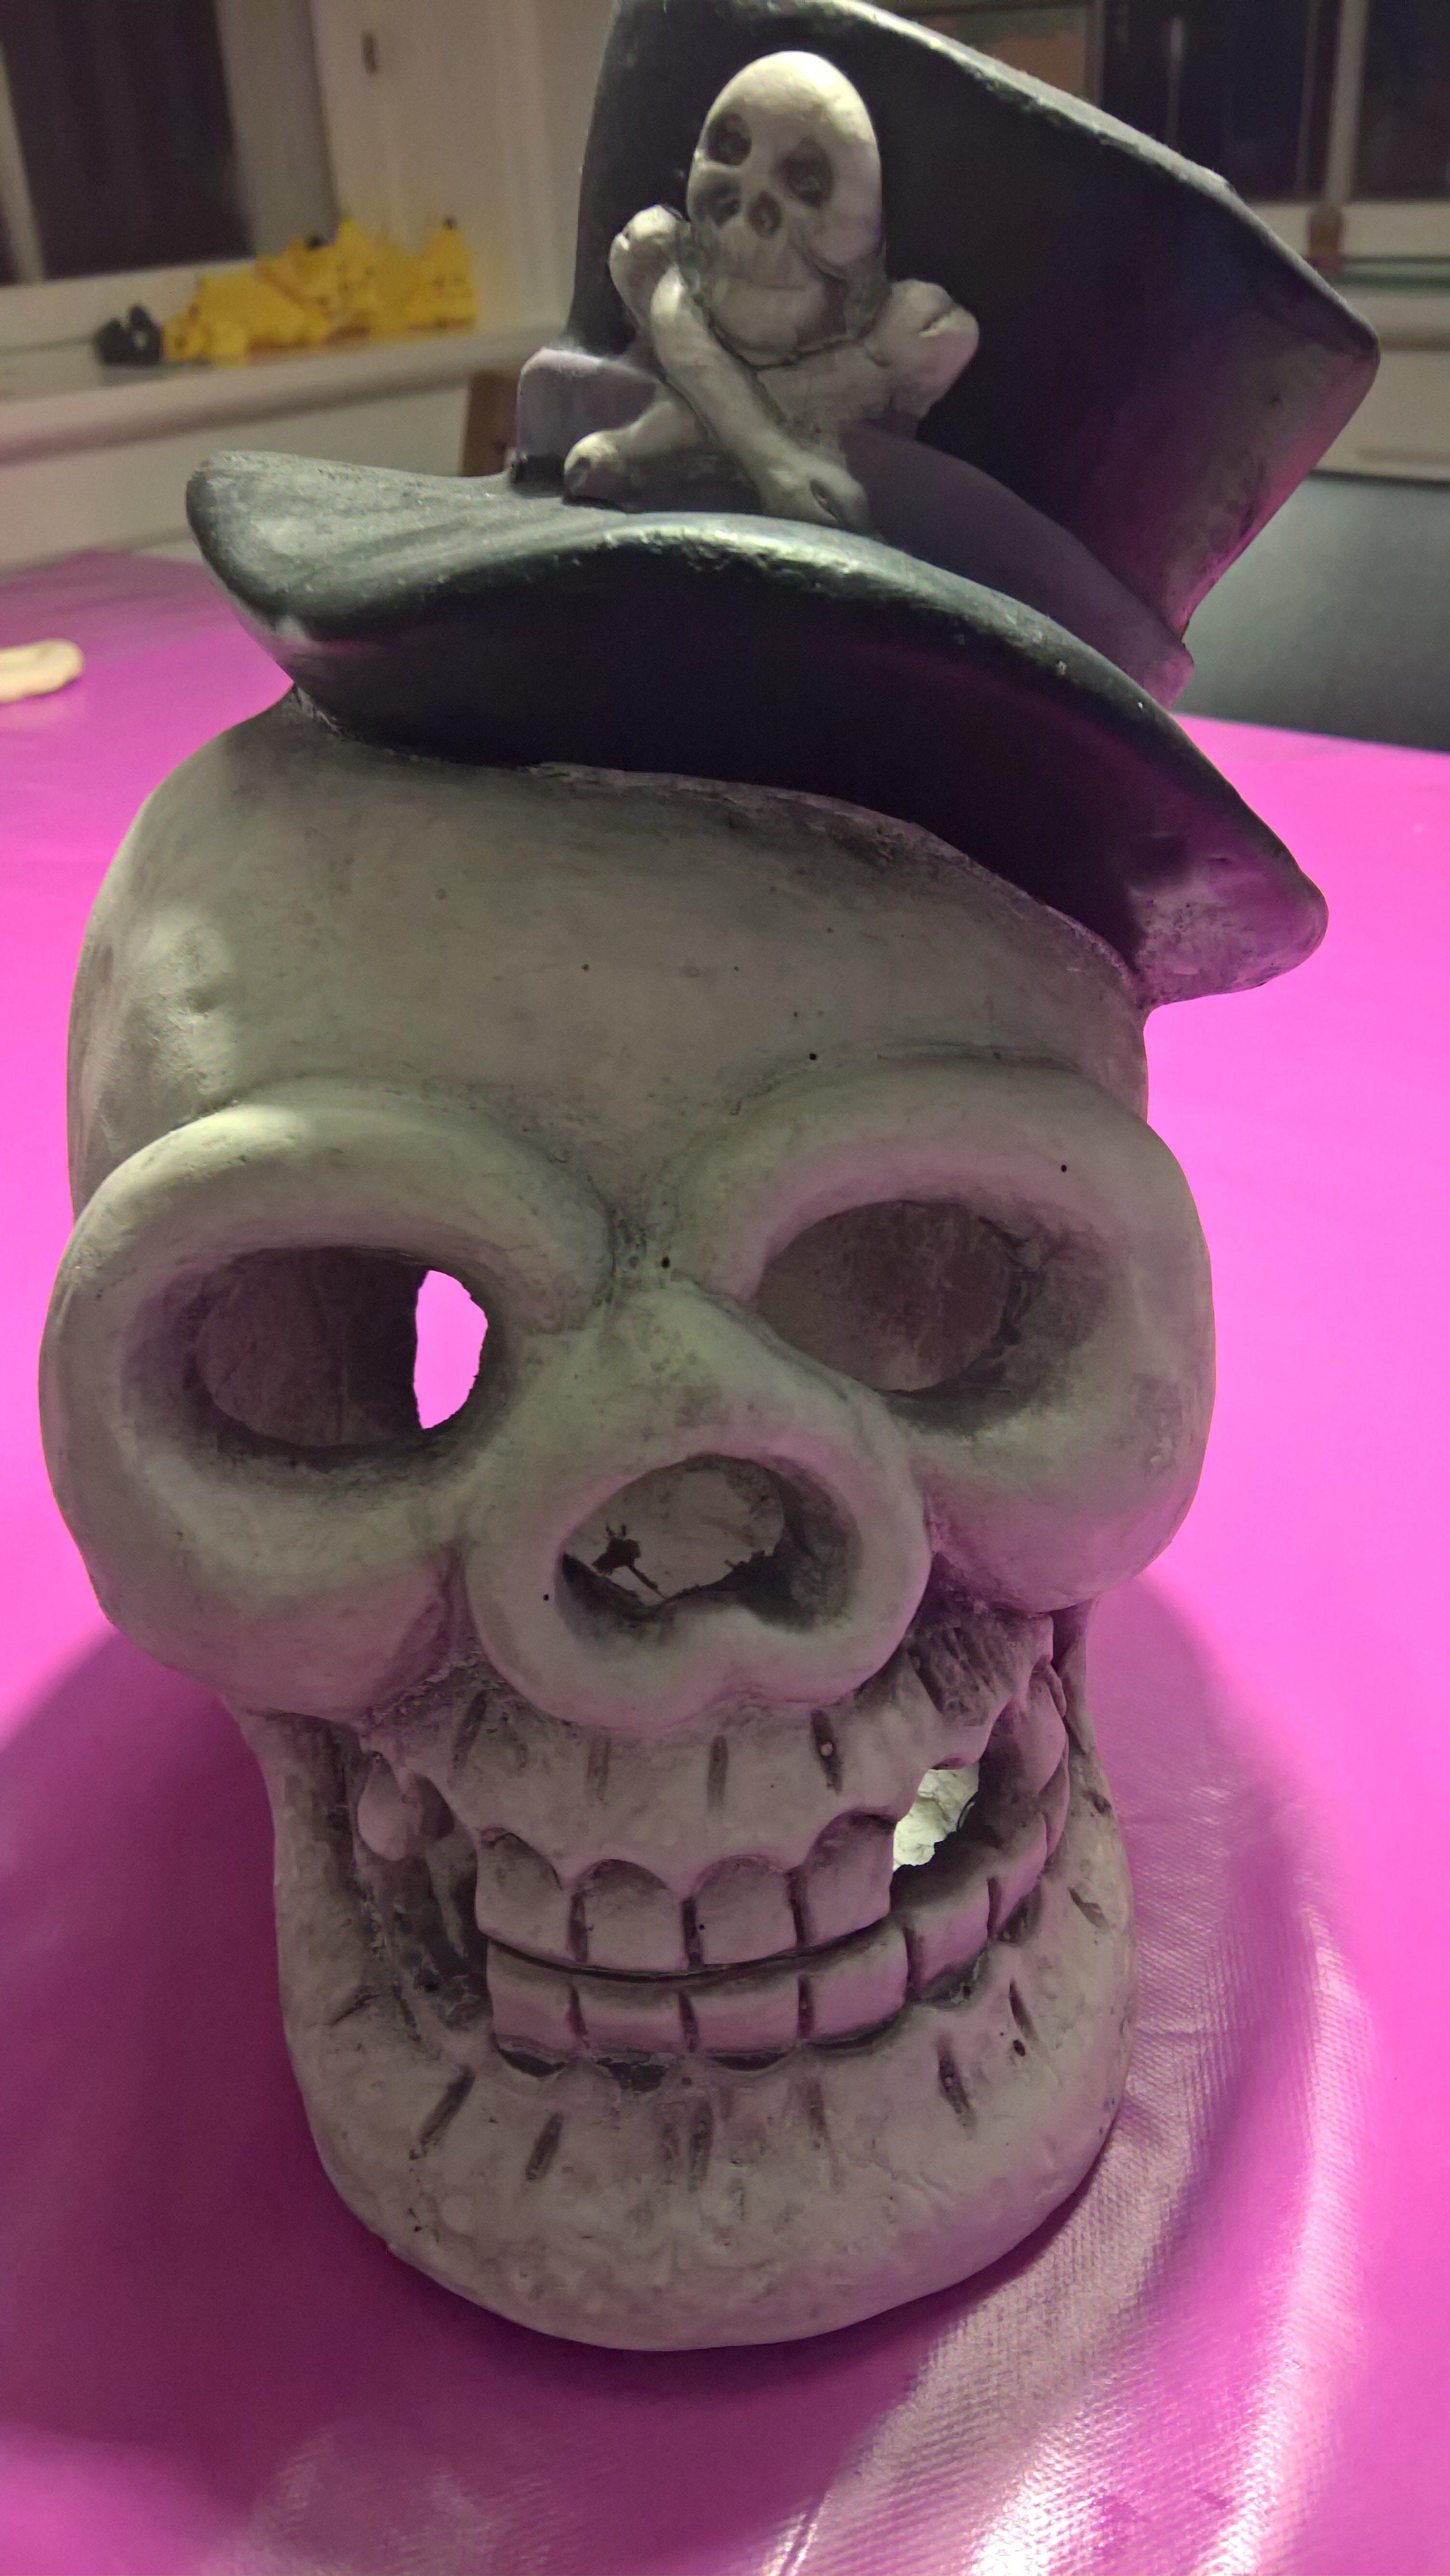 Creepy Greeting Skull for Halloween